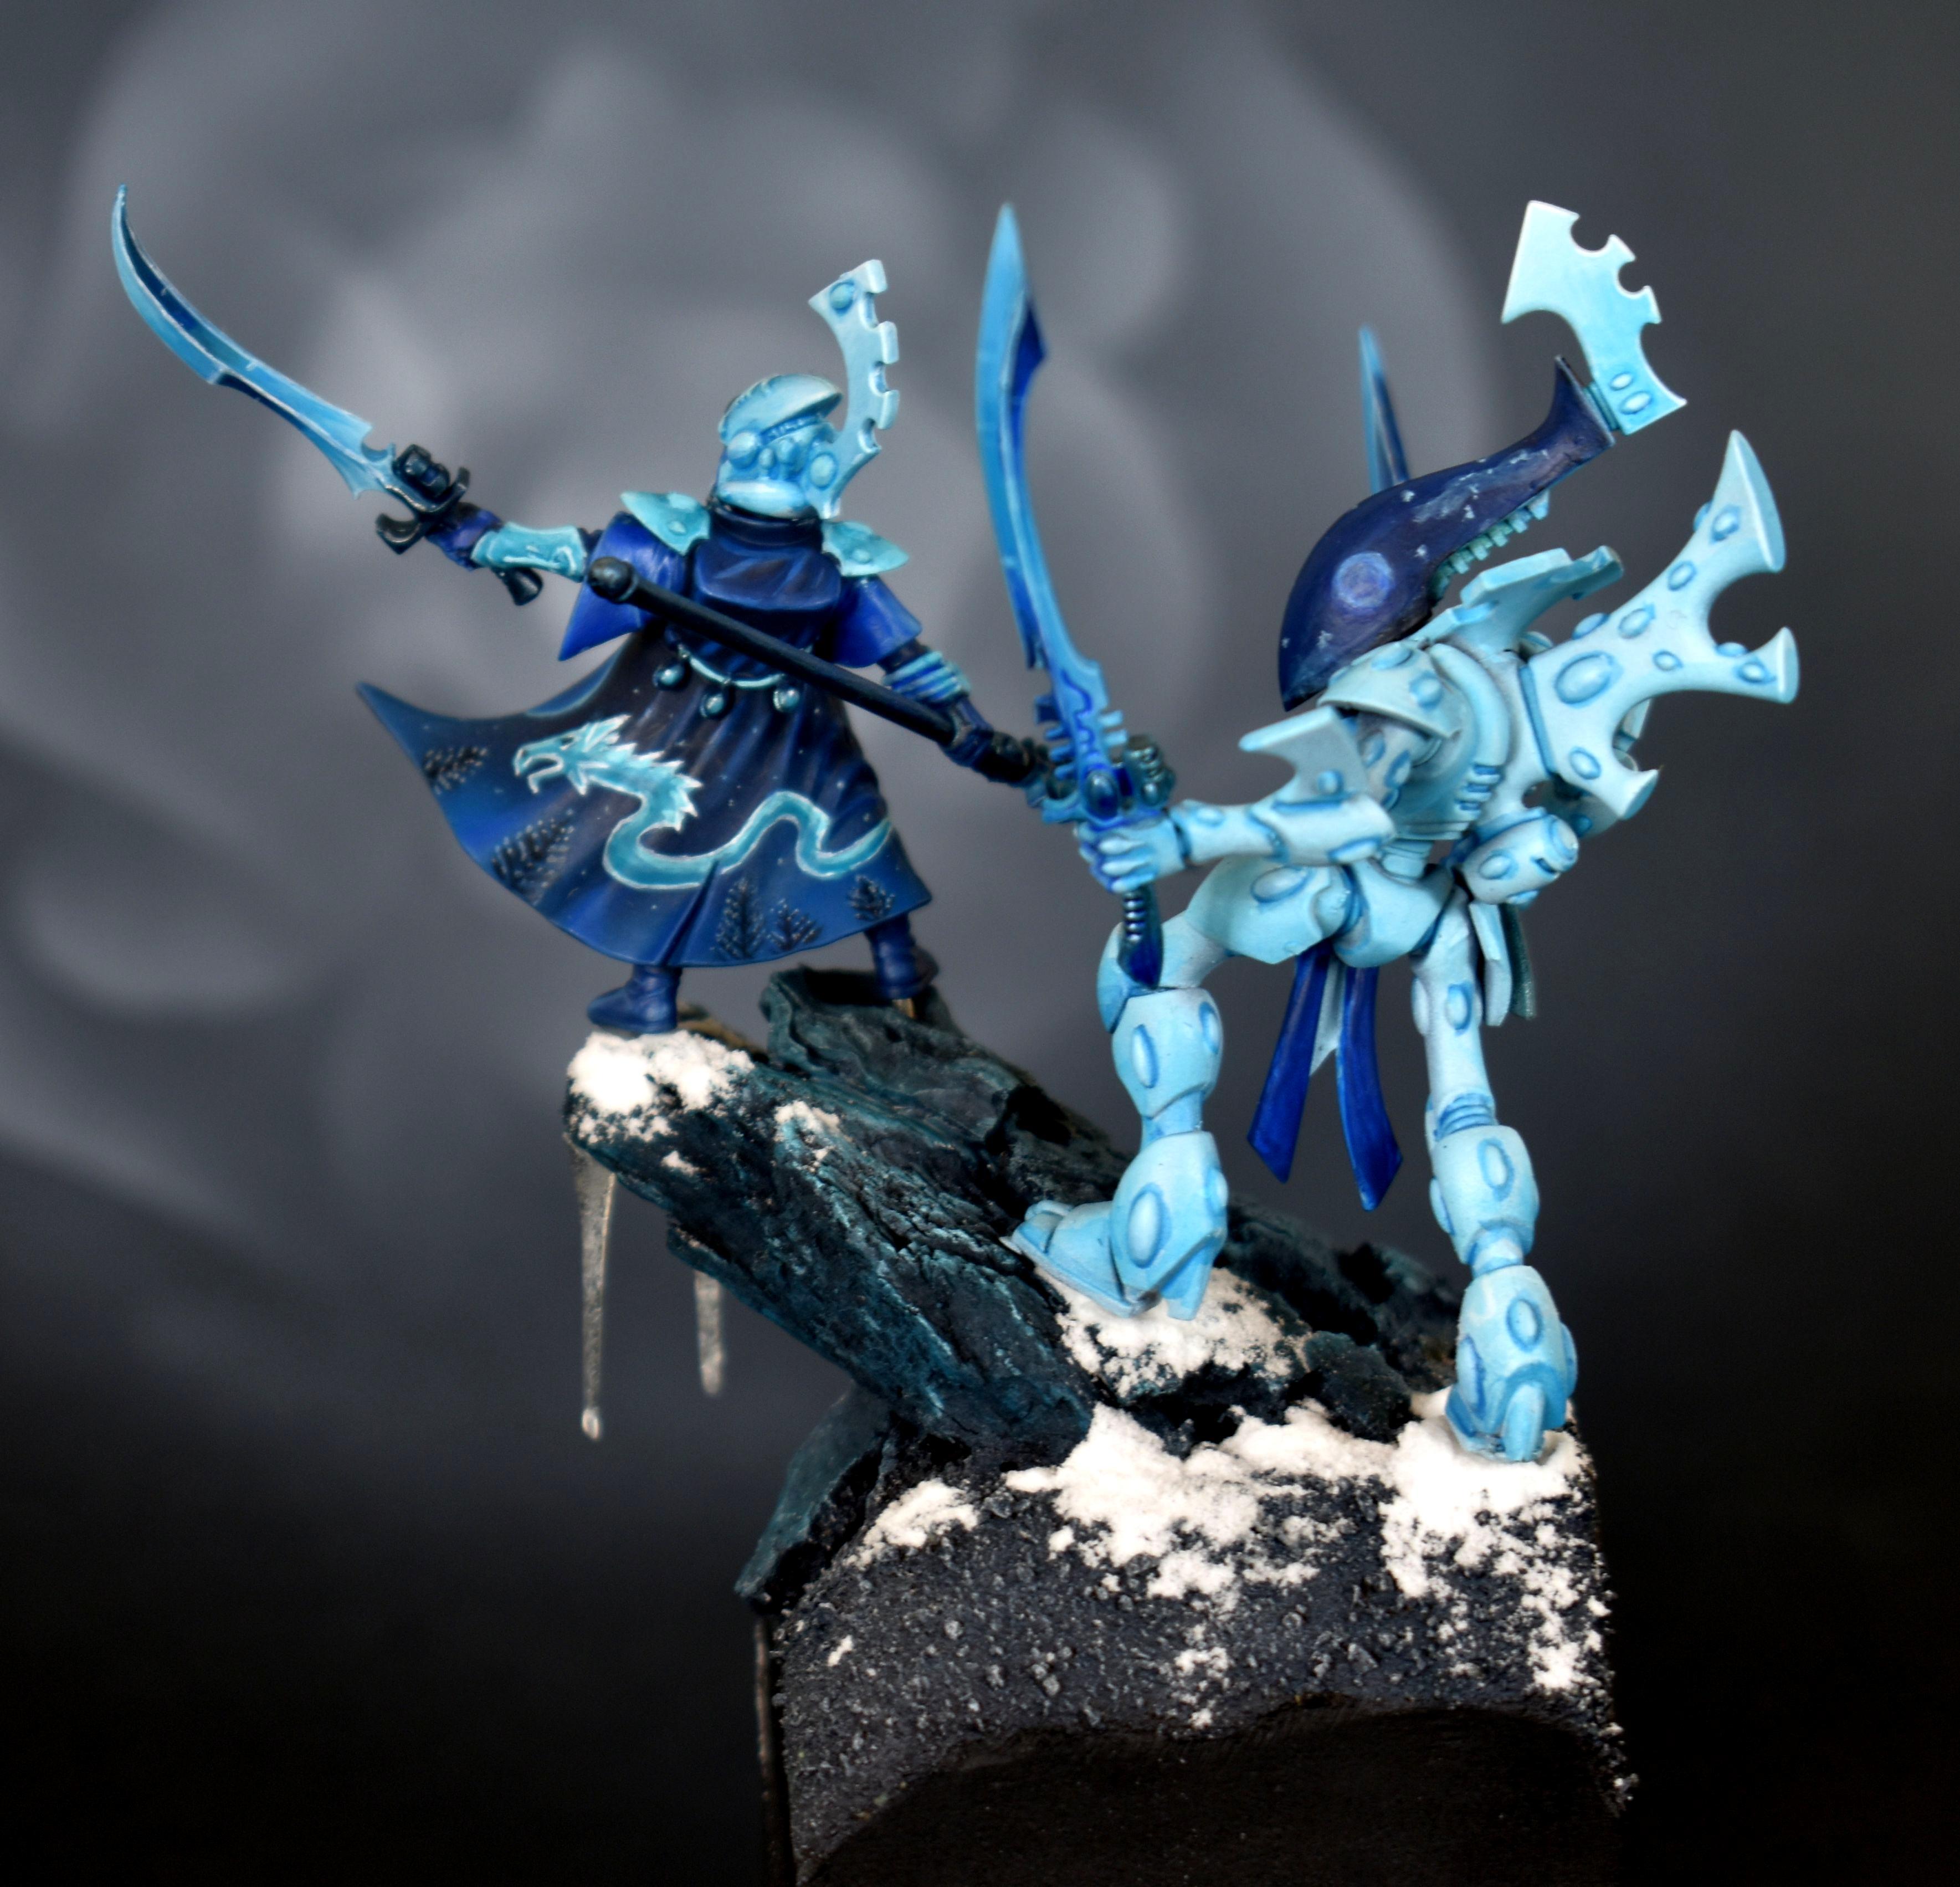 Blue, Farseer, Ice, Monochrome, Snow, Winter